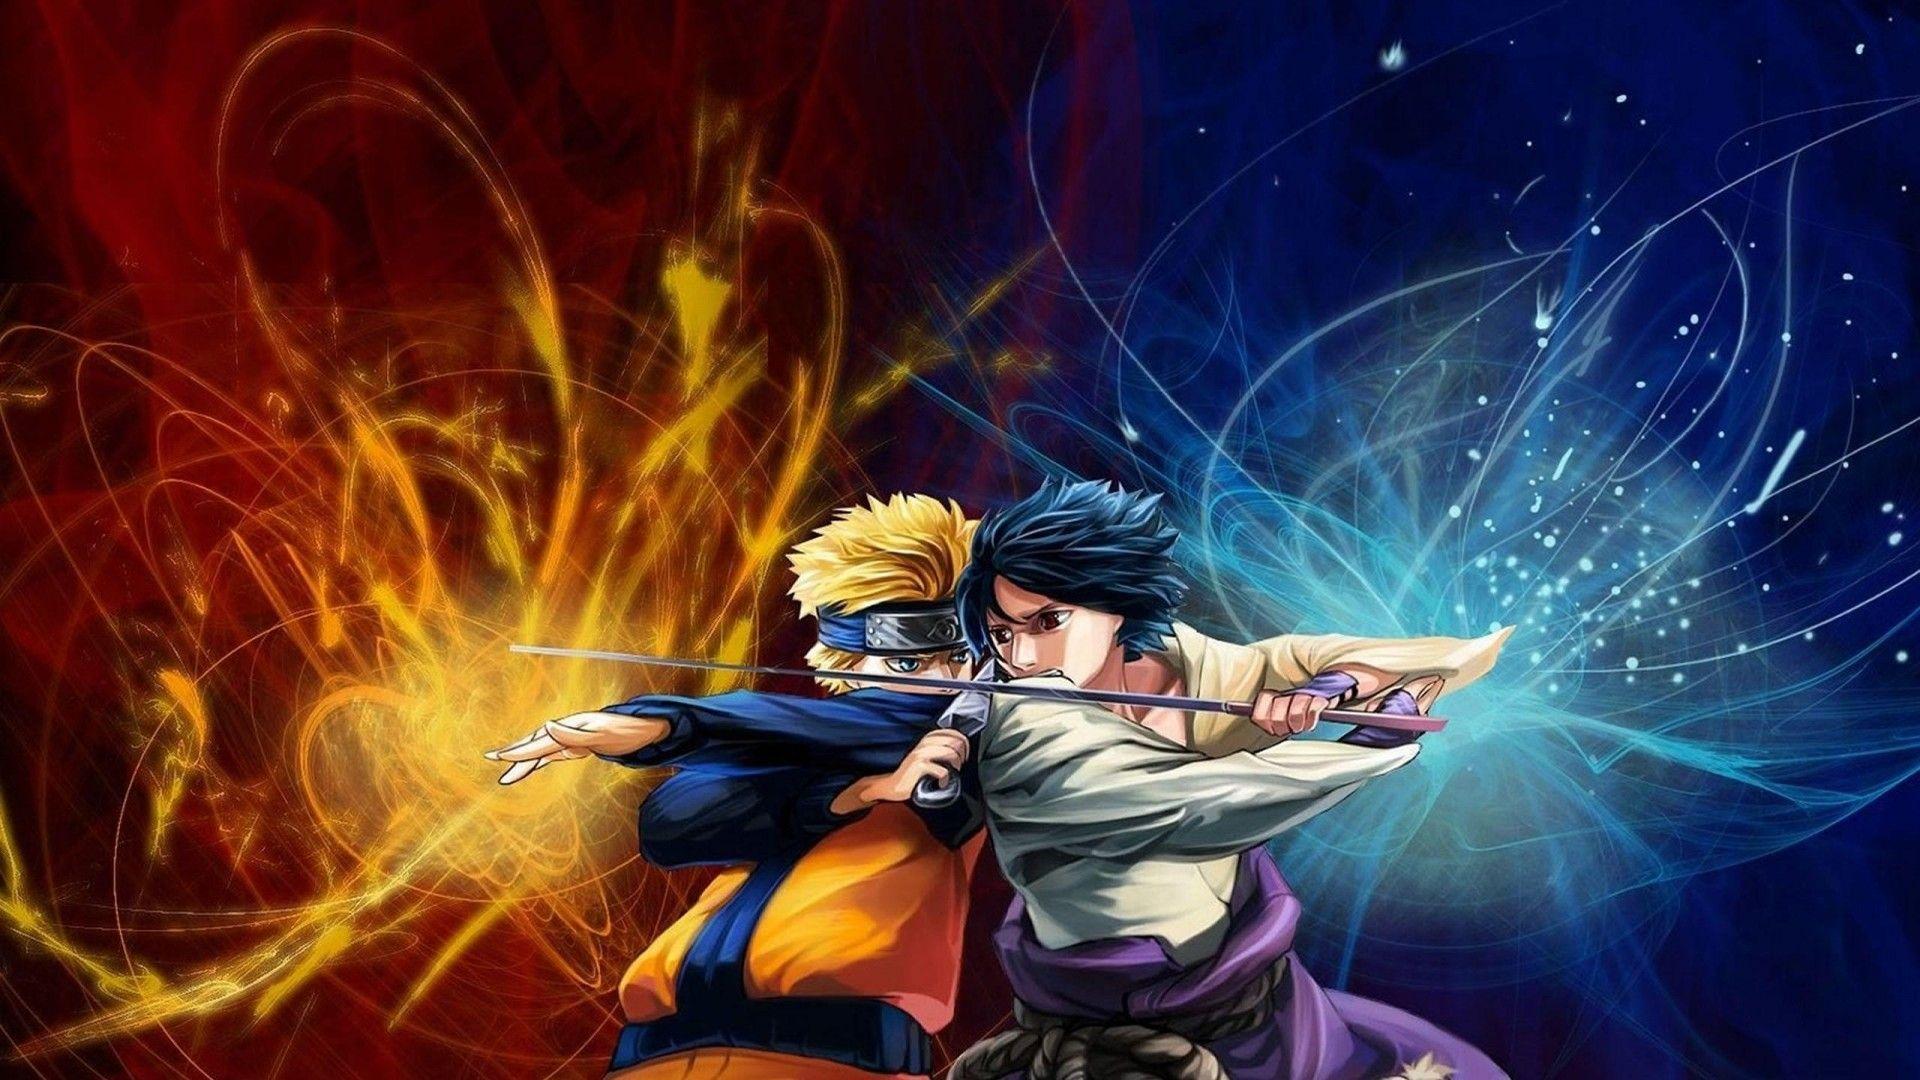 Anime Wallpaper Naruto on WallpaperGet.com